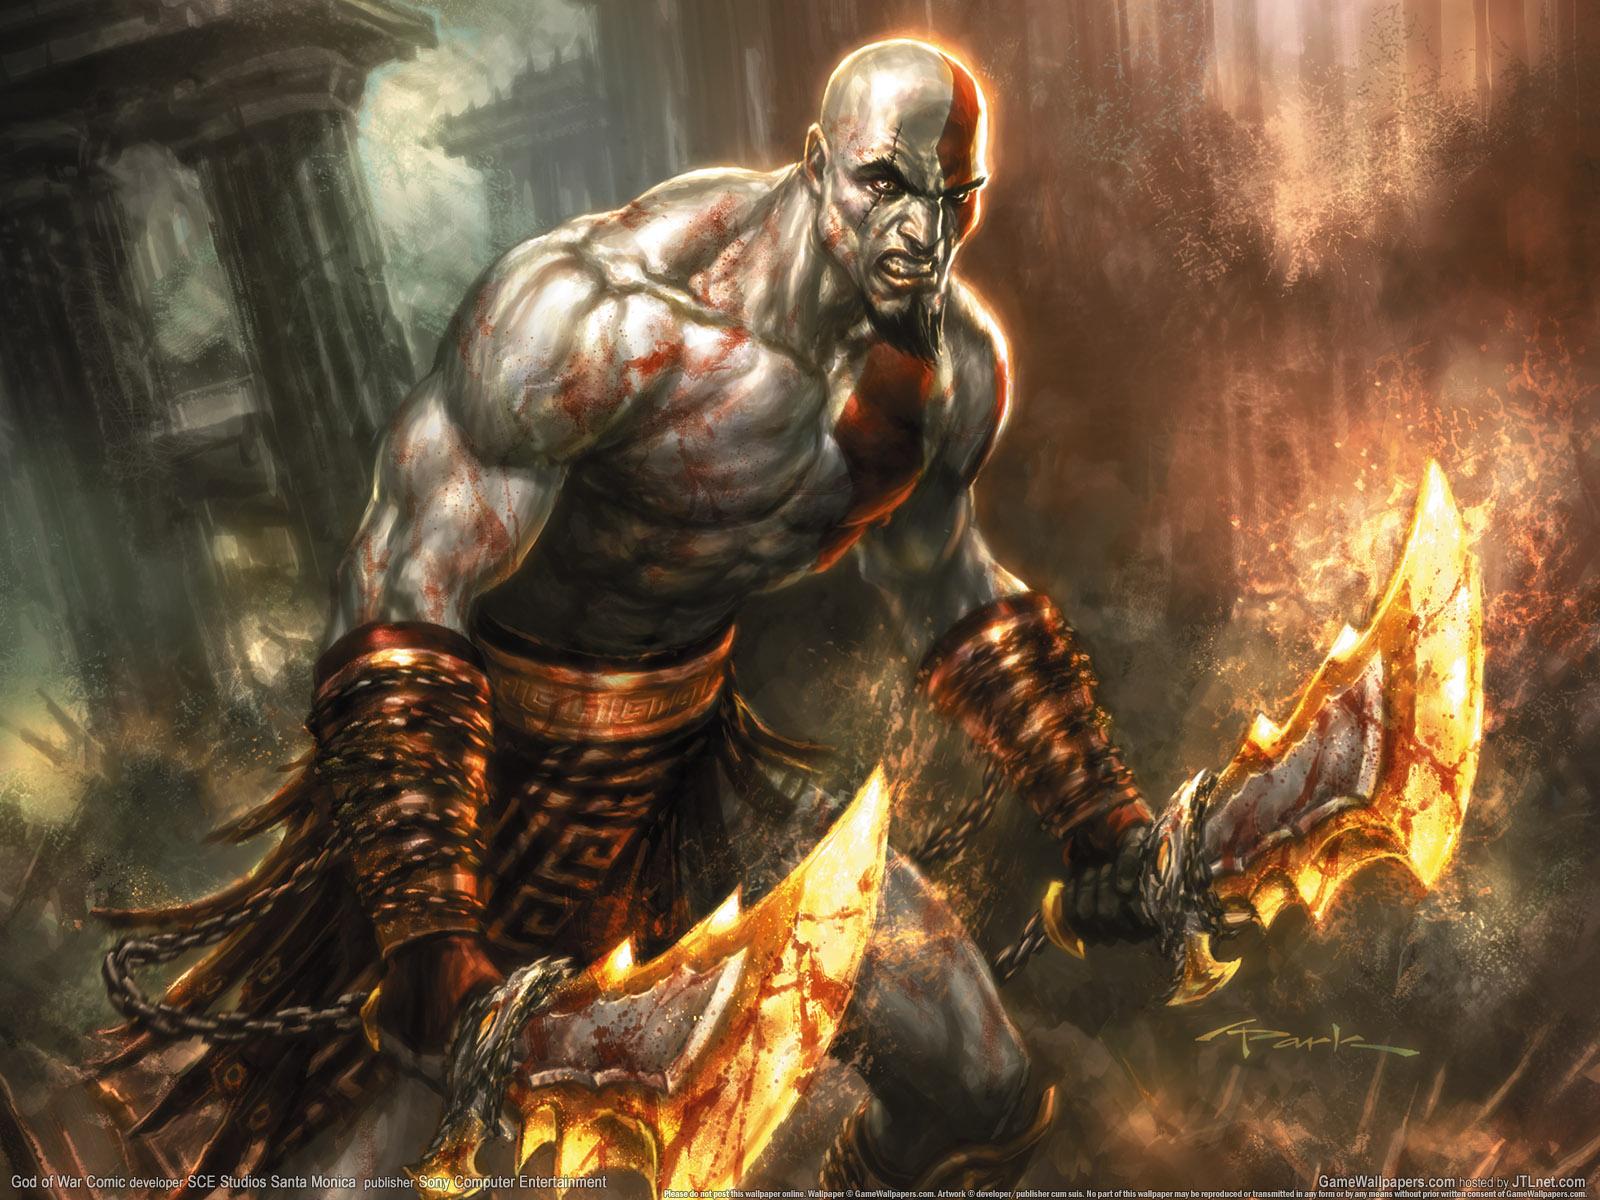 god of war 1 wallpaper hd - photo #19